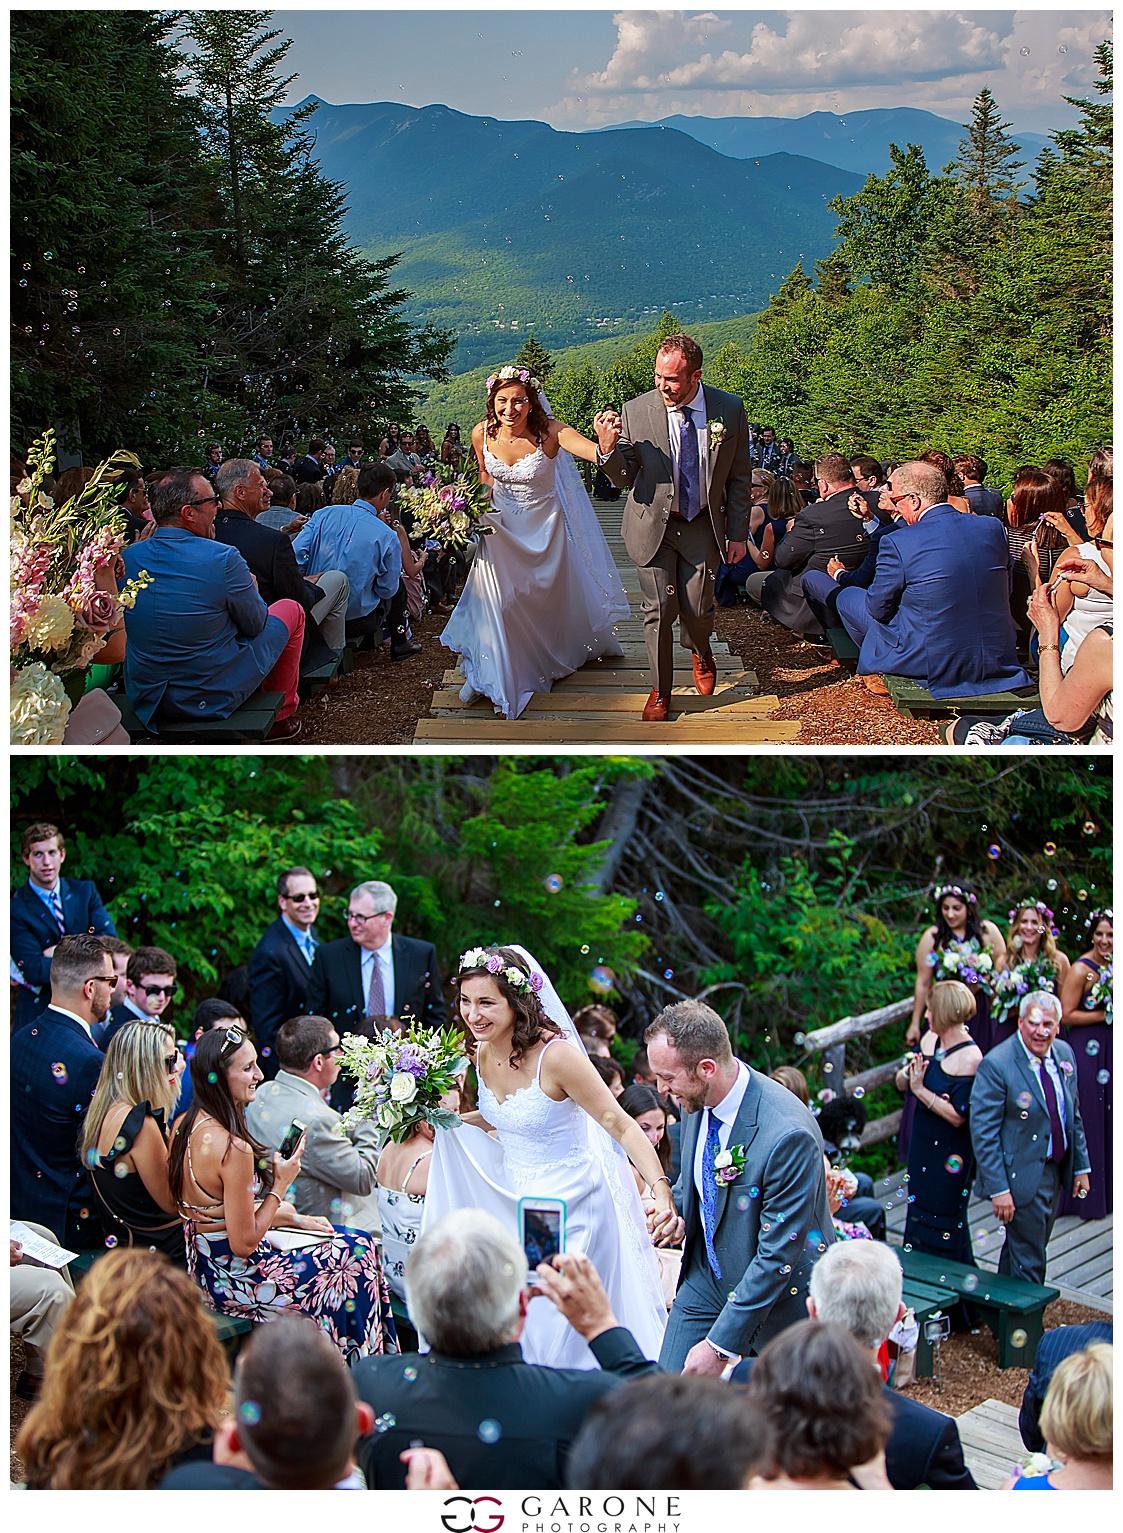 Natalie_Eric_Loon_Wedding_White_Mountain_Wedding_Photography_Garone_Photography_0020.jpg